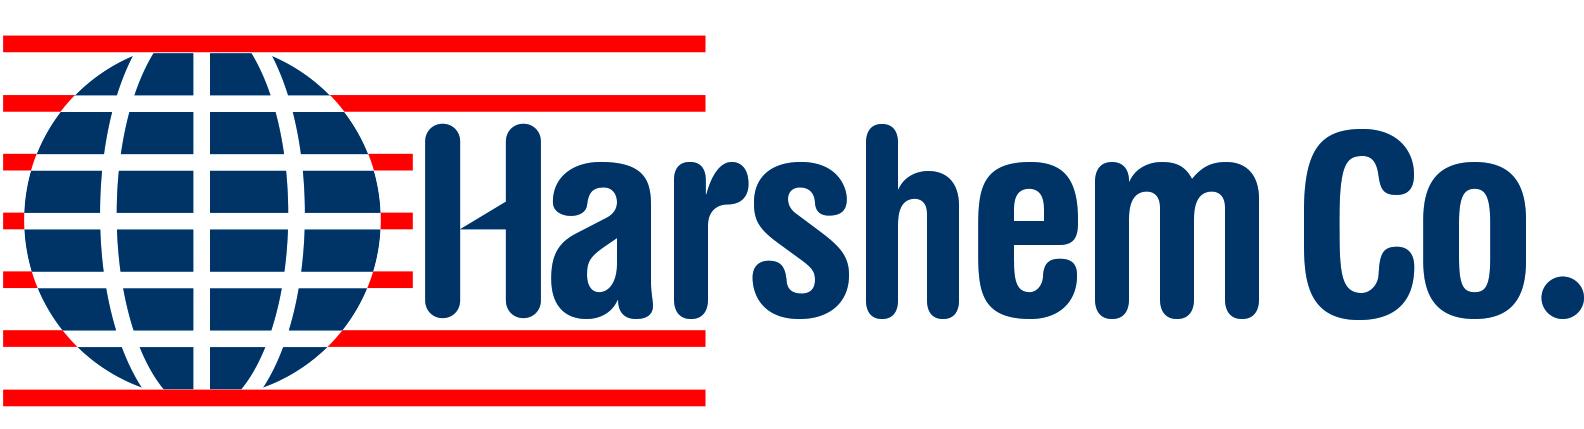 Harshem Company